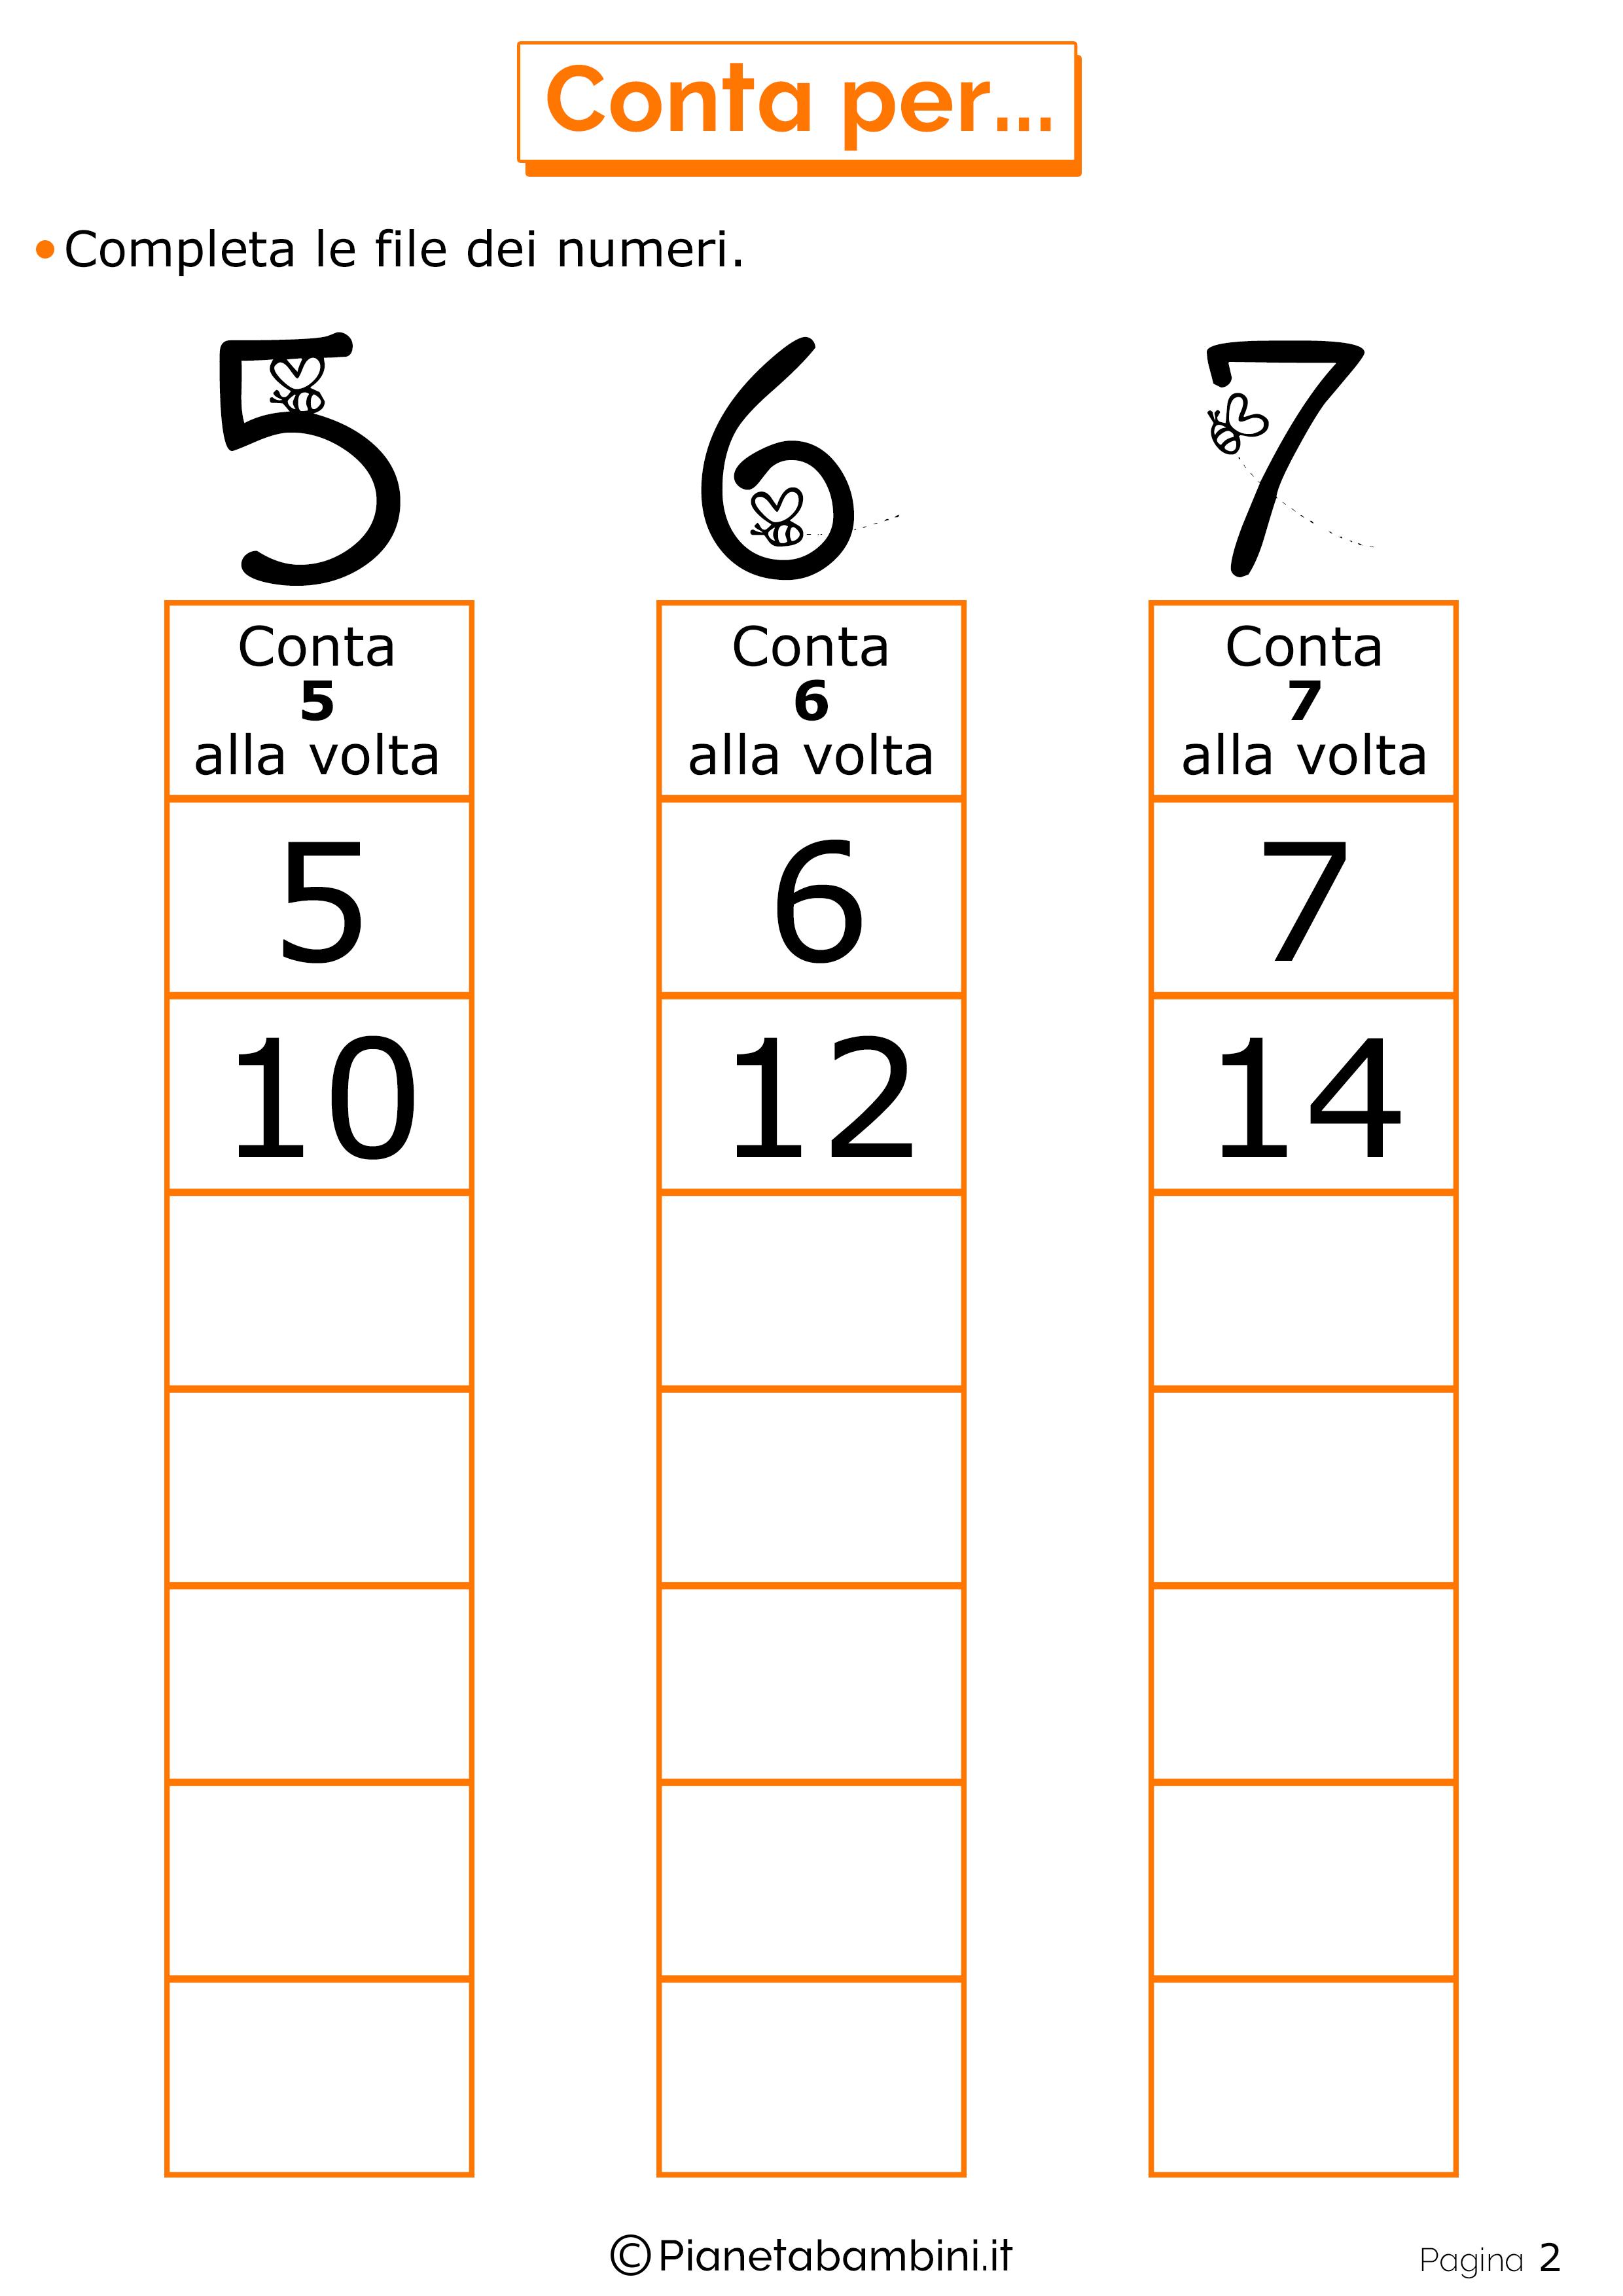 Conta-per_2